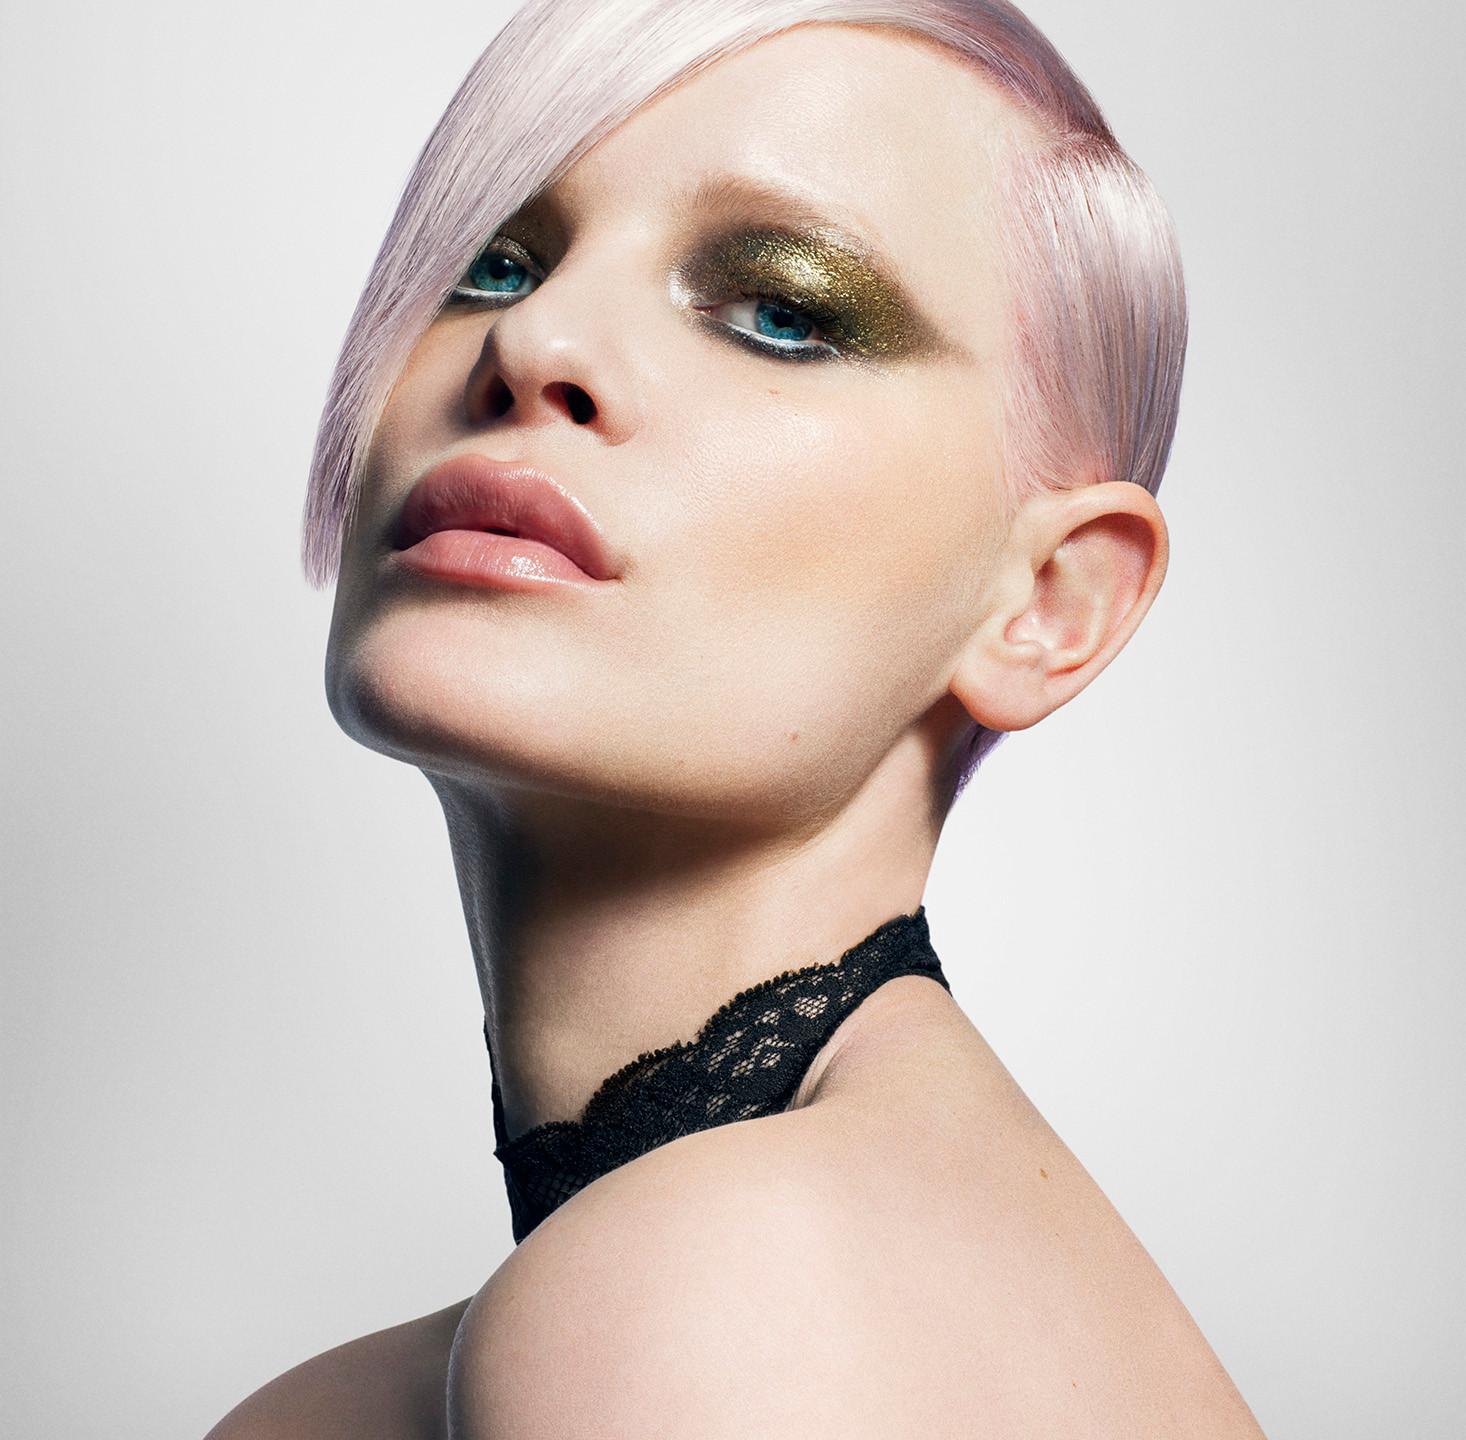 Garcia Morales - Hair & Beauty Photographer in London